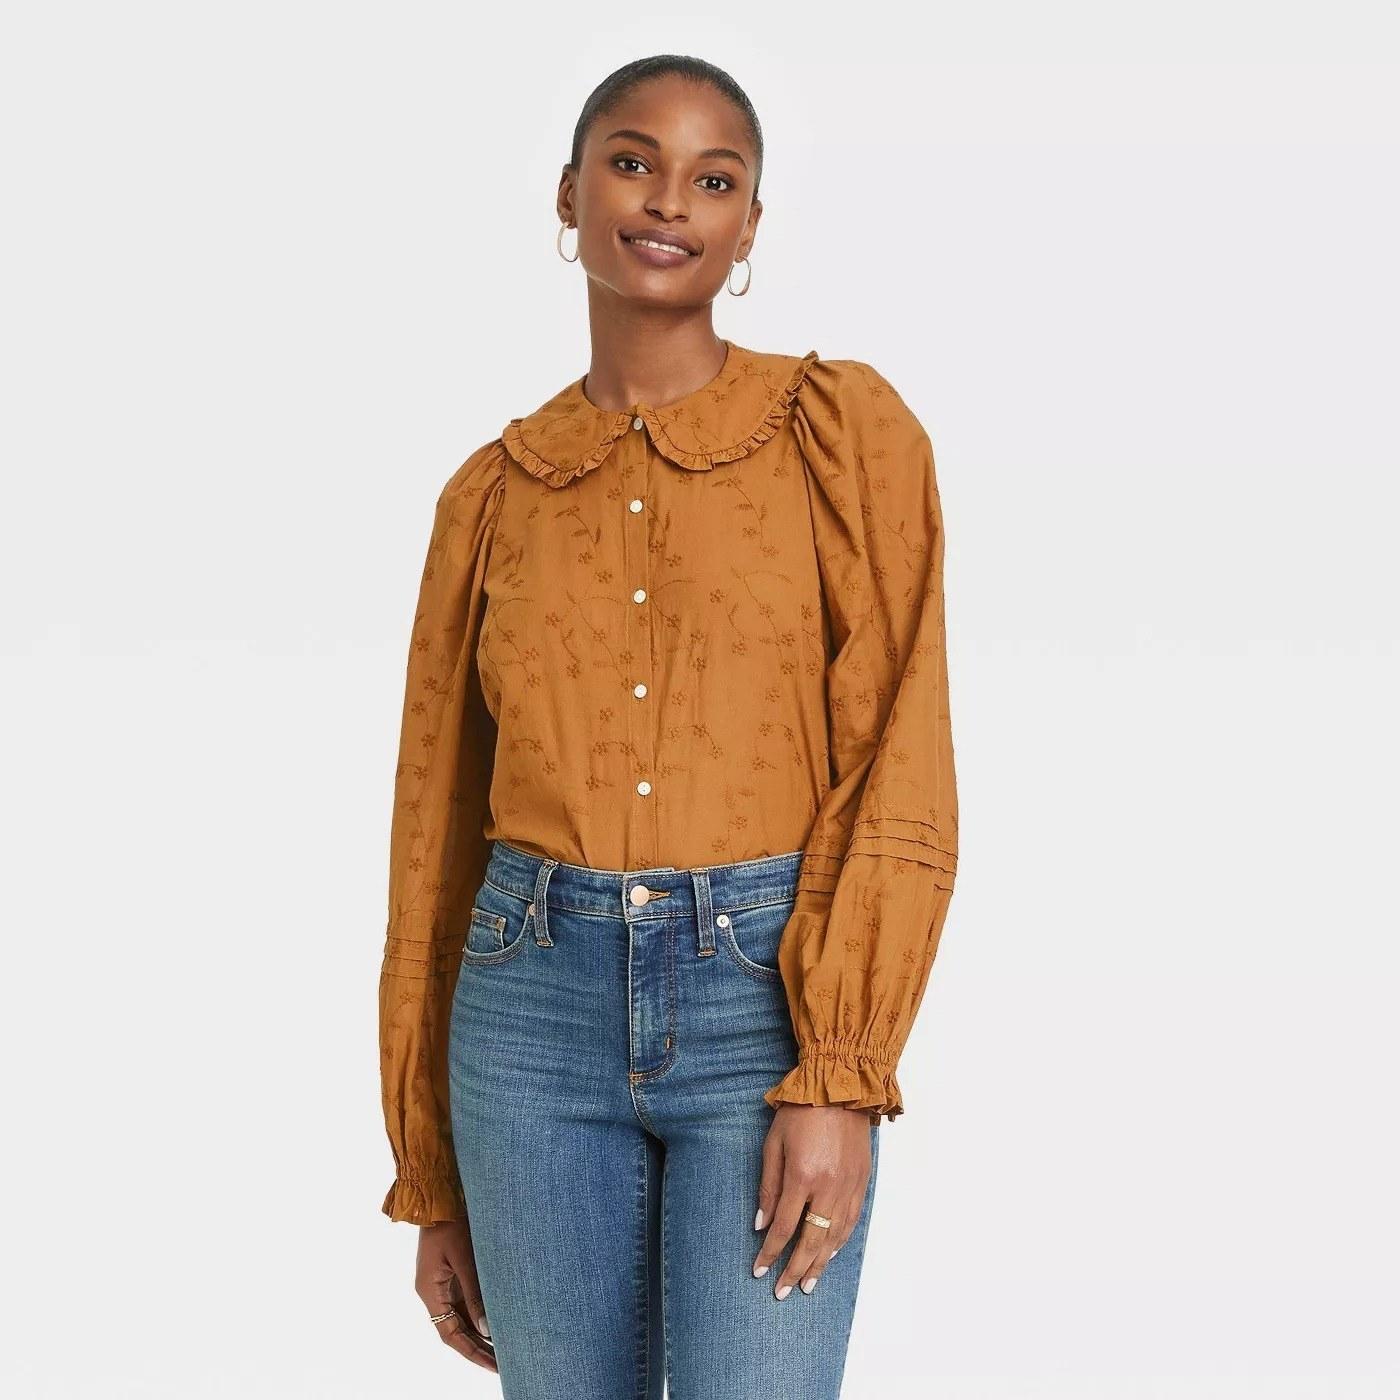 Model wearing orange blouse